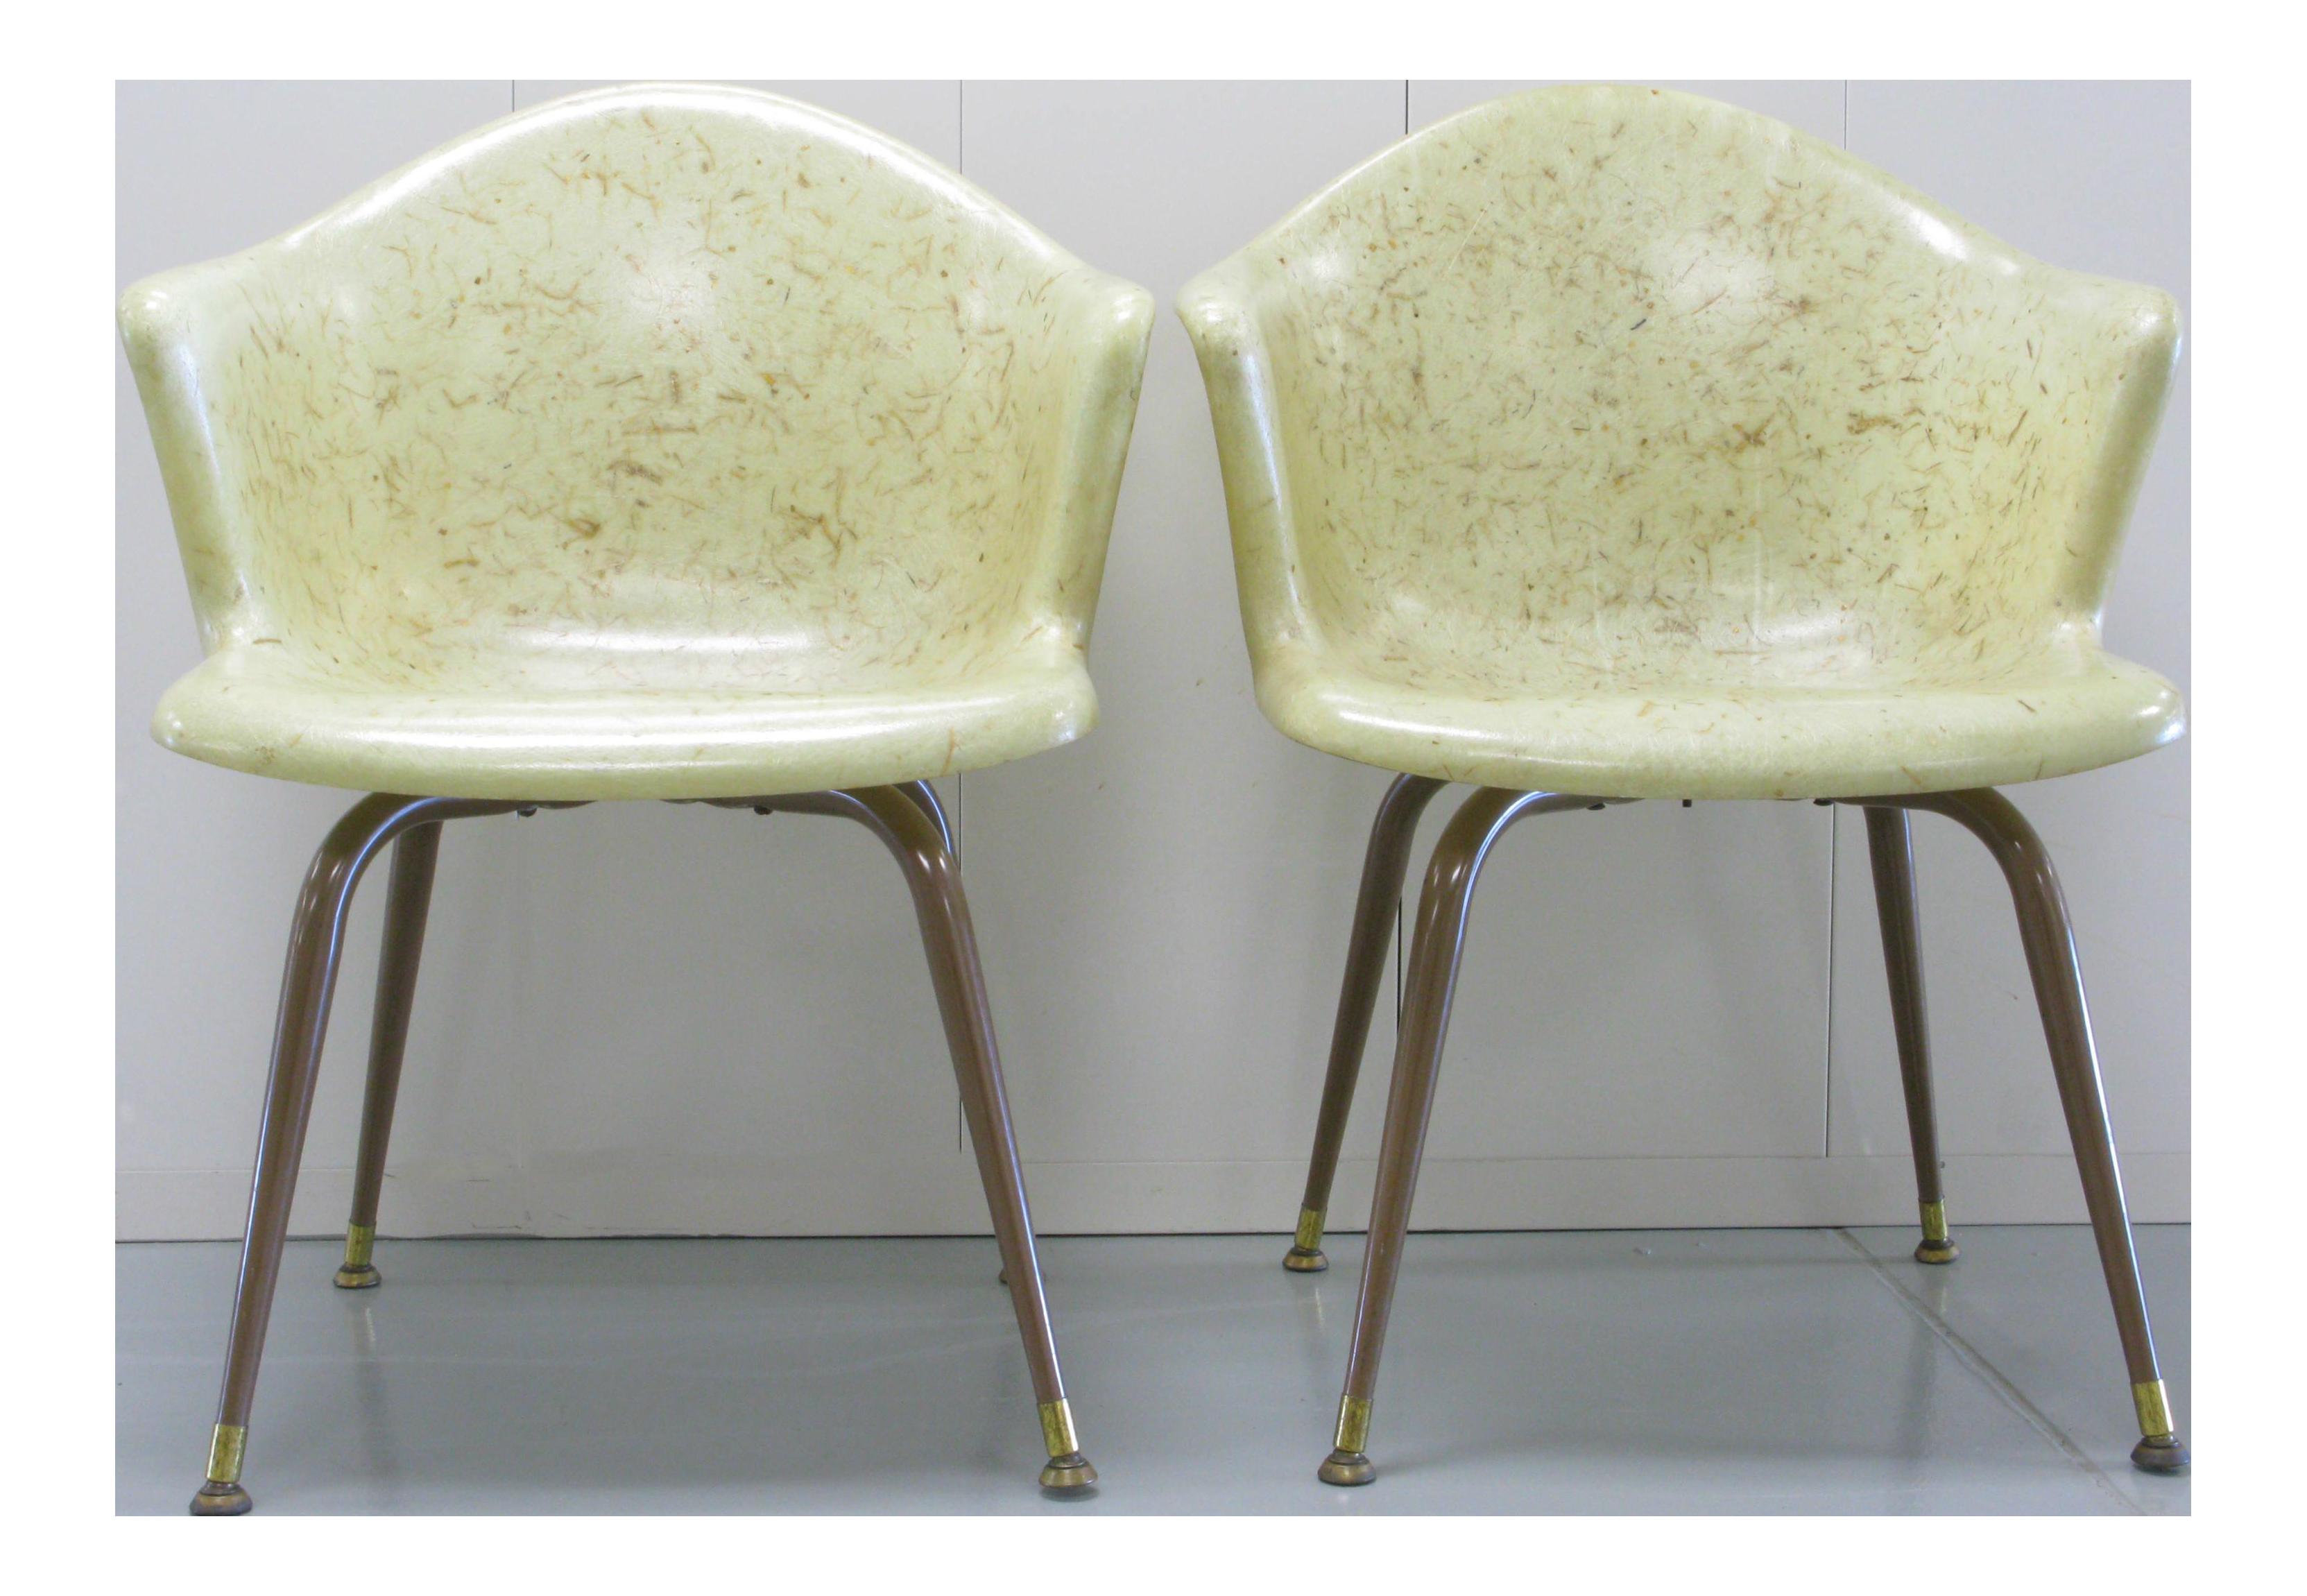 Mid-Century Fiberglass Chairs - A Pair For Sale  sc 1 st  Chairish & Mid-Century Fiberglass Chairs - A Pair | Chairish